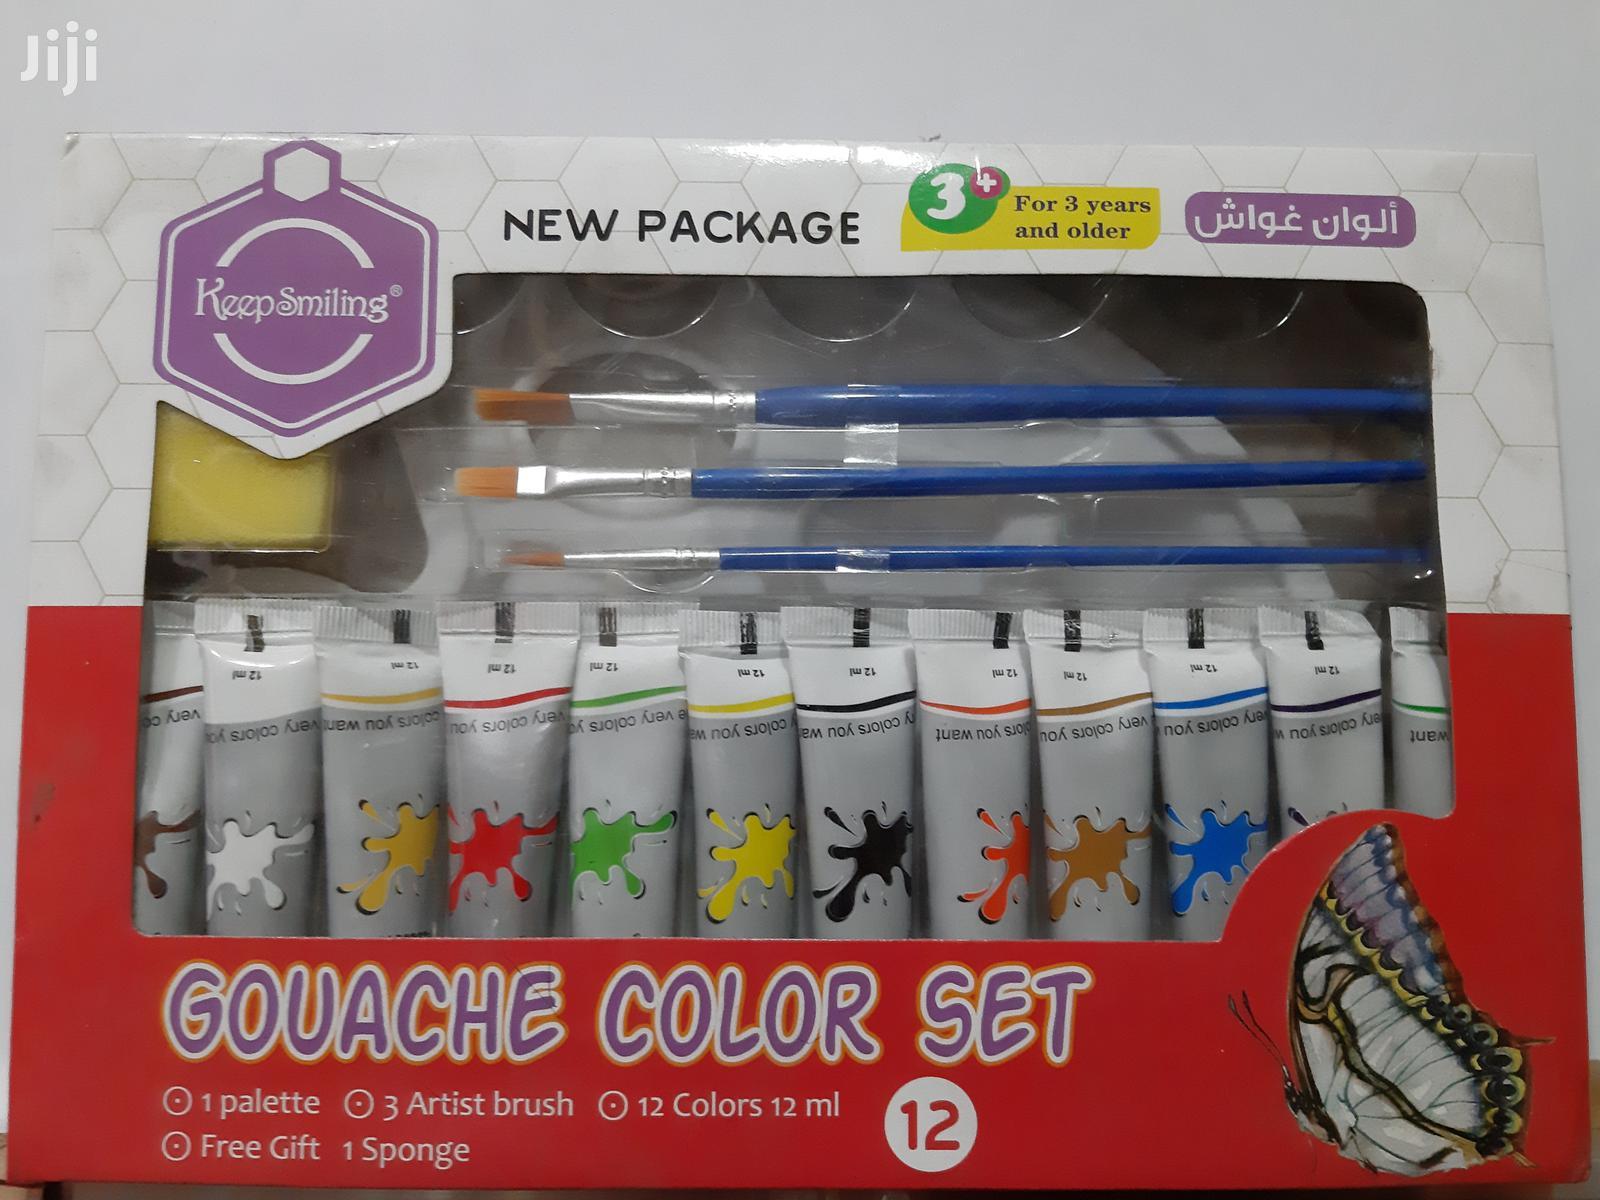 Gouache Colour Set